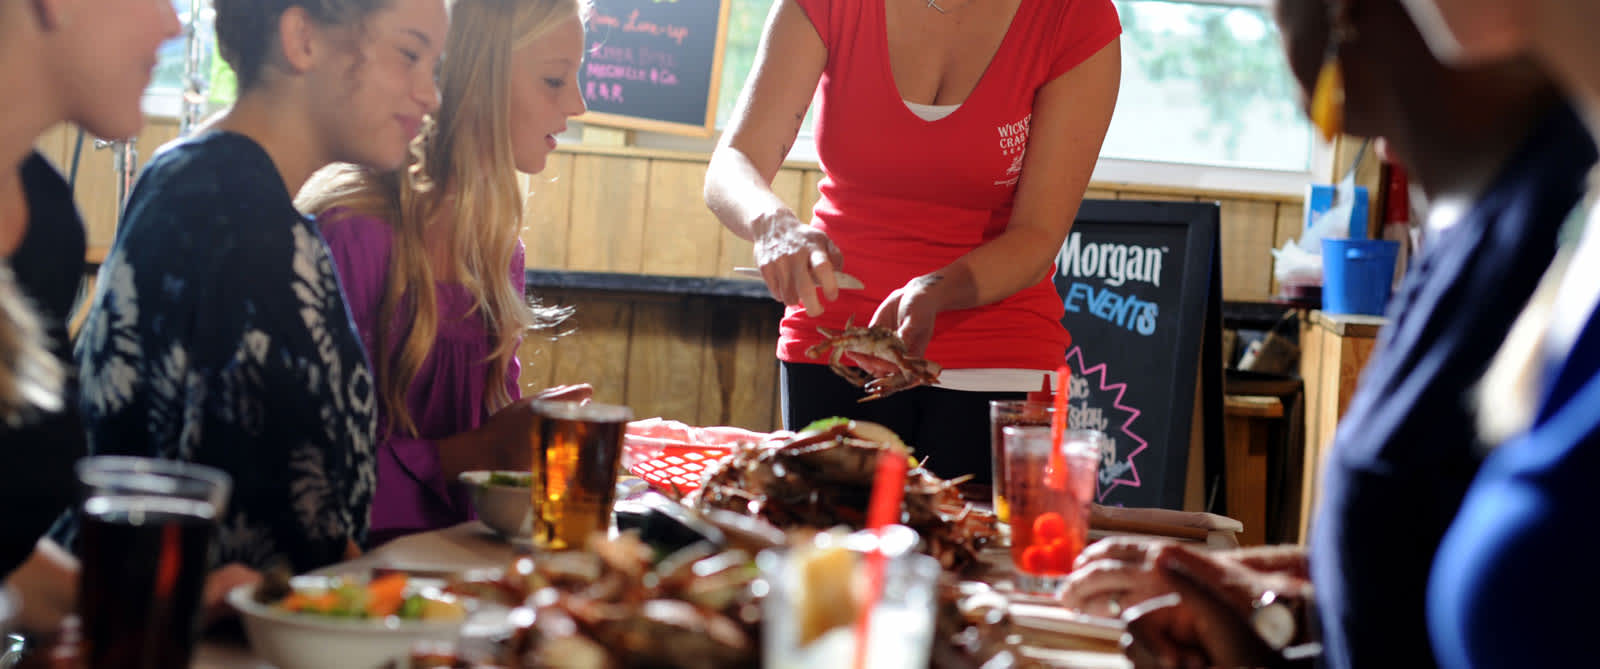 Dining_Restaurant_Waitress5